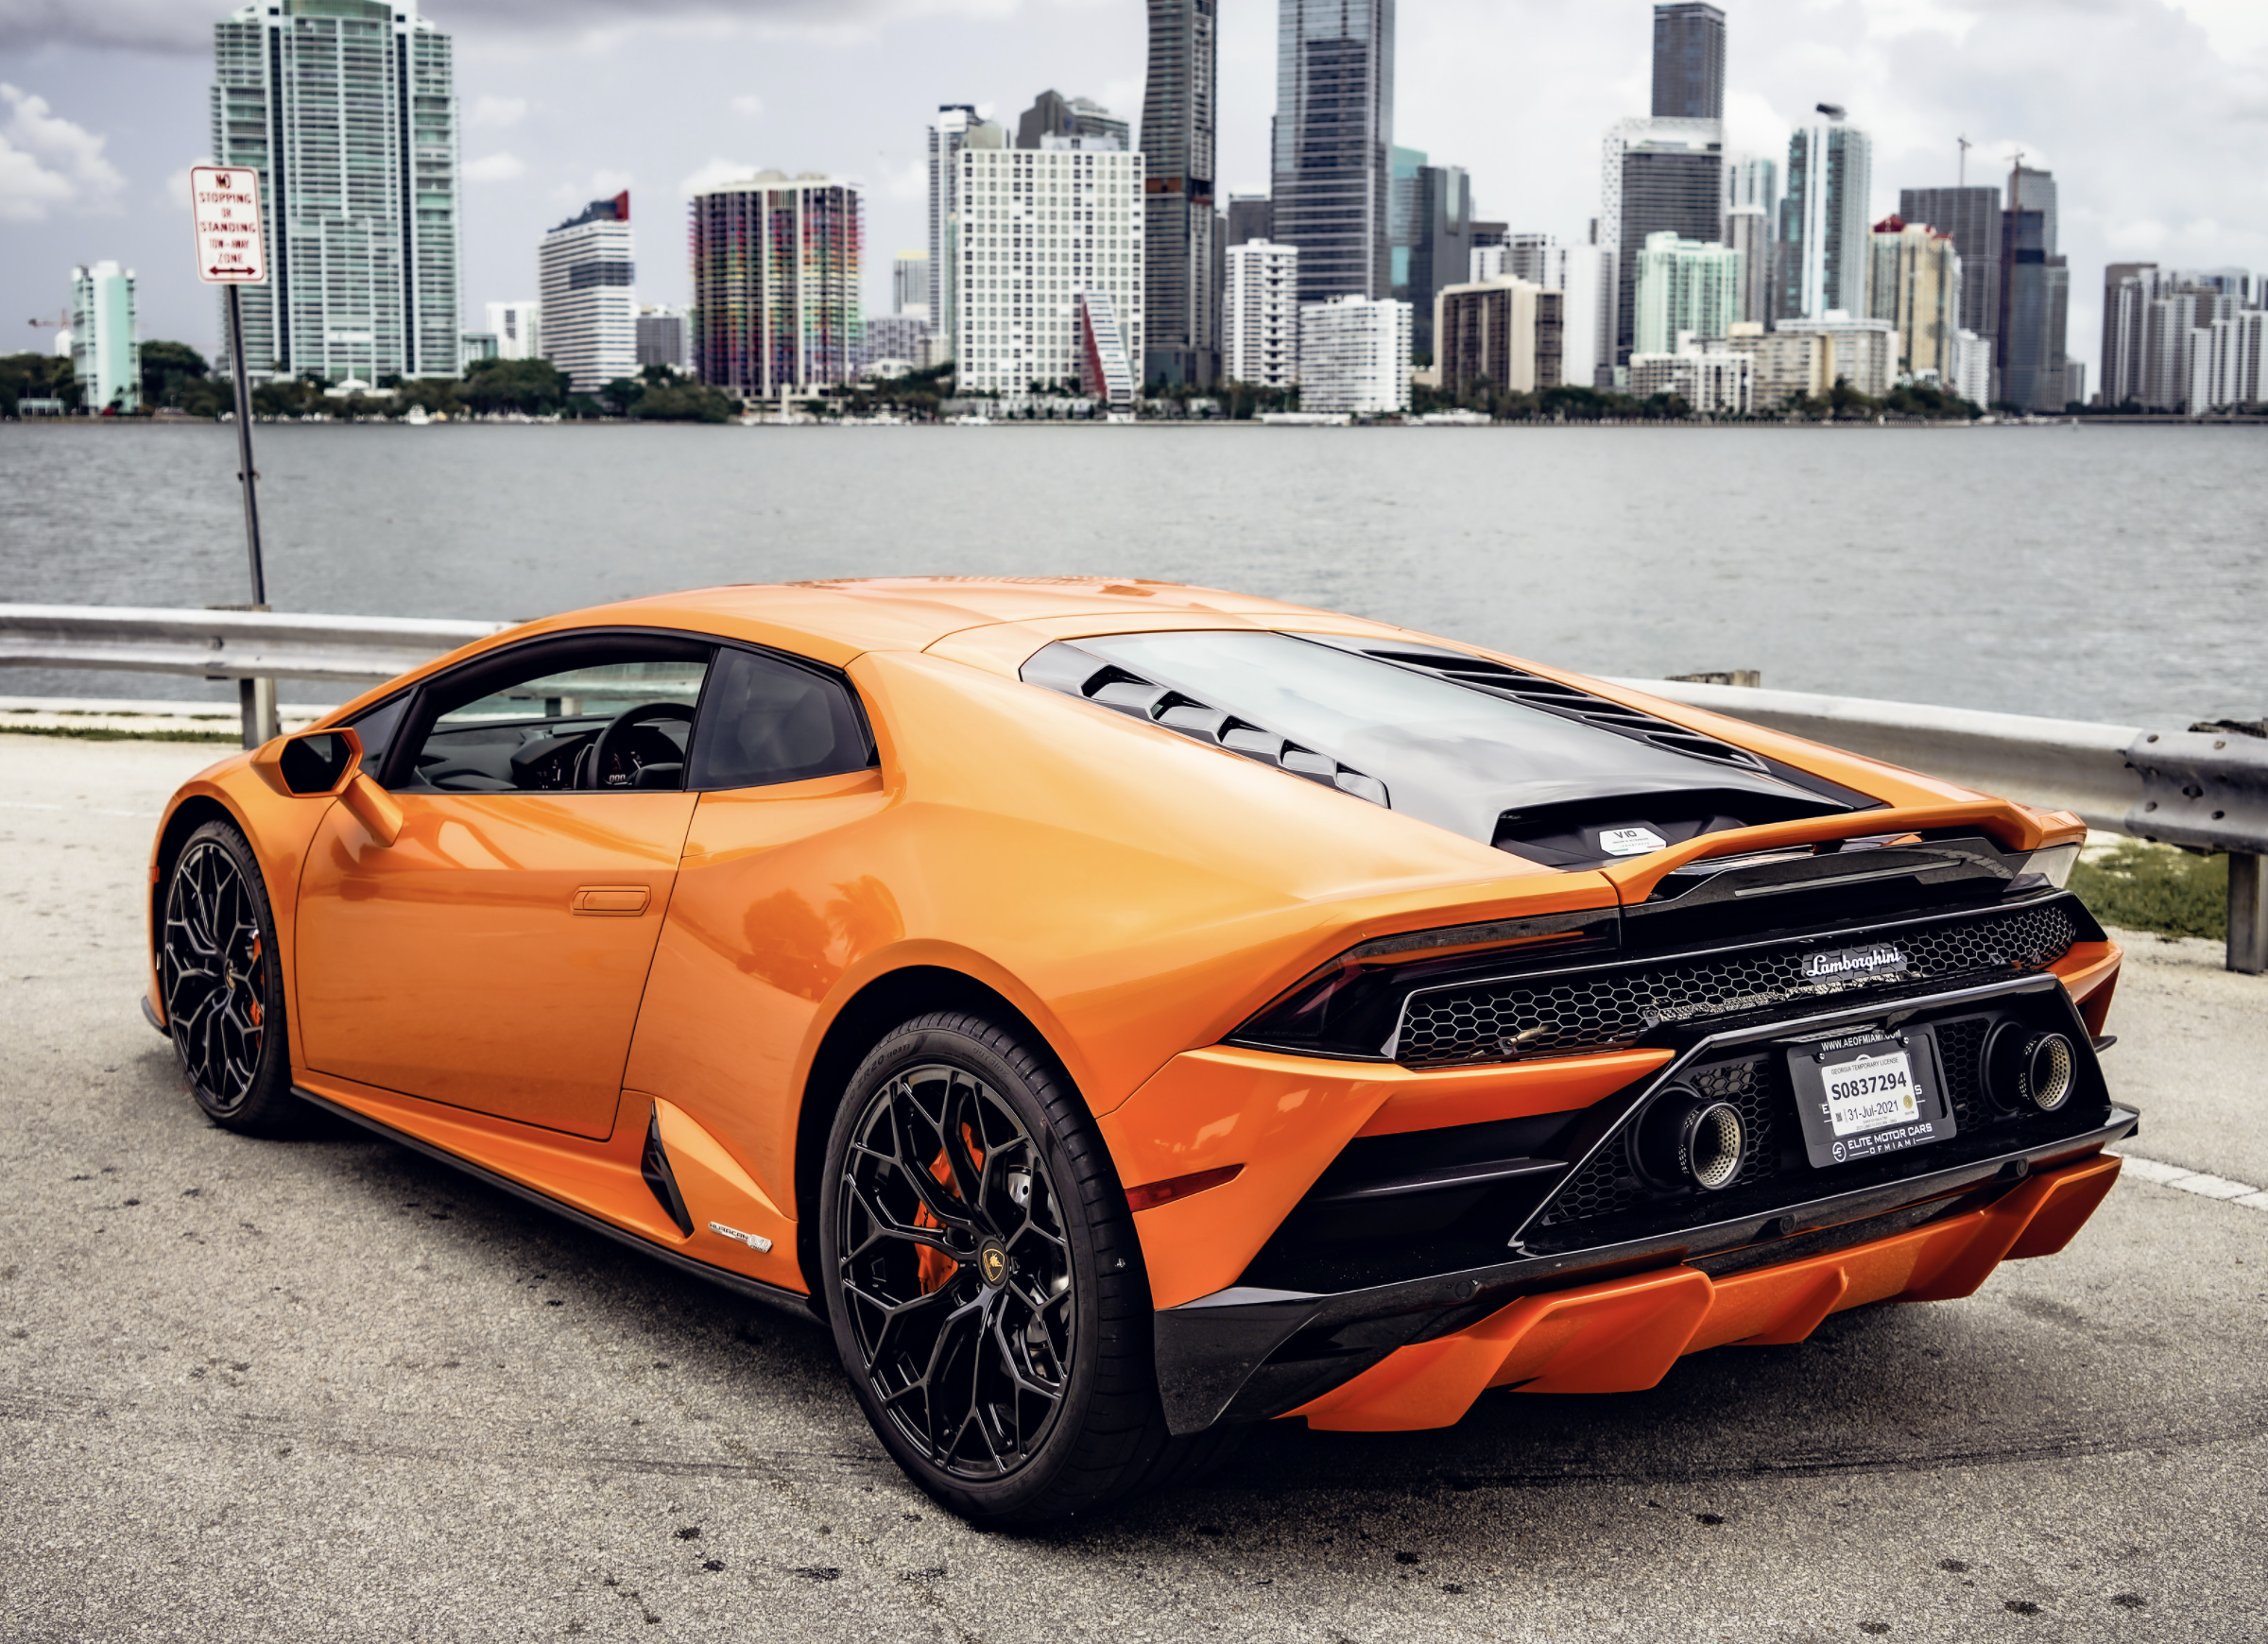 Image #12 of our  Lamborghini Huracan EVO Orange Coupe    In Miami Fort Lauderdale Palm Beach South Florida